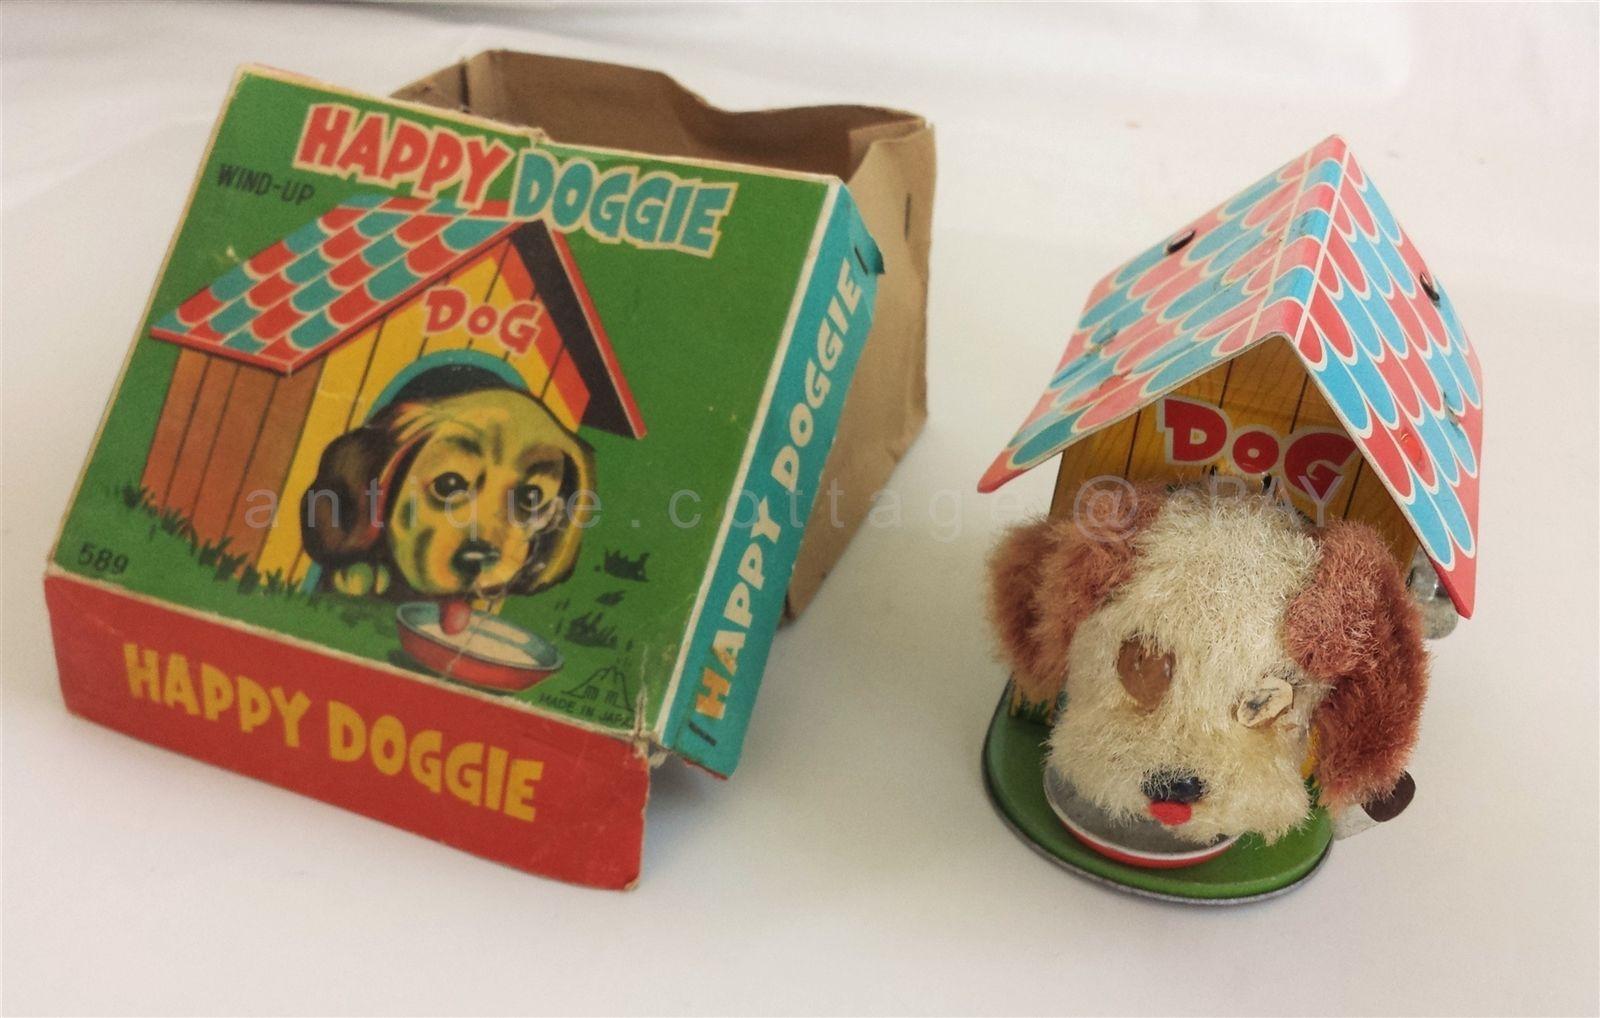 Toys Vintagetoys 1940 Vintage Tin Metal Dog House Wind Up Toy Made In Japan Happy Doggie Works Wind Up Toys Dog House Vintage Tin [ 1018 x 1600 Pixel ]